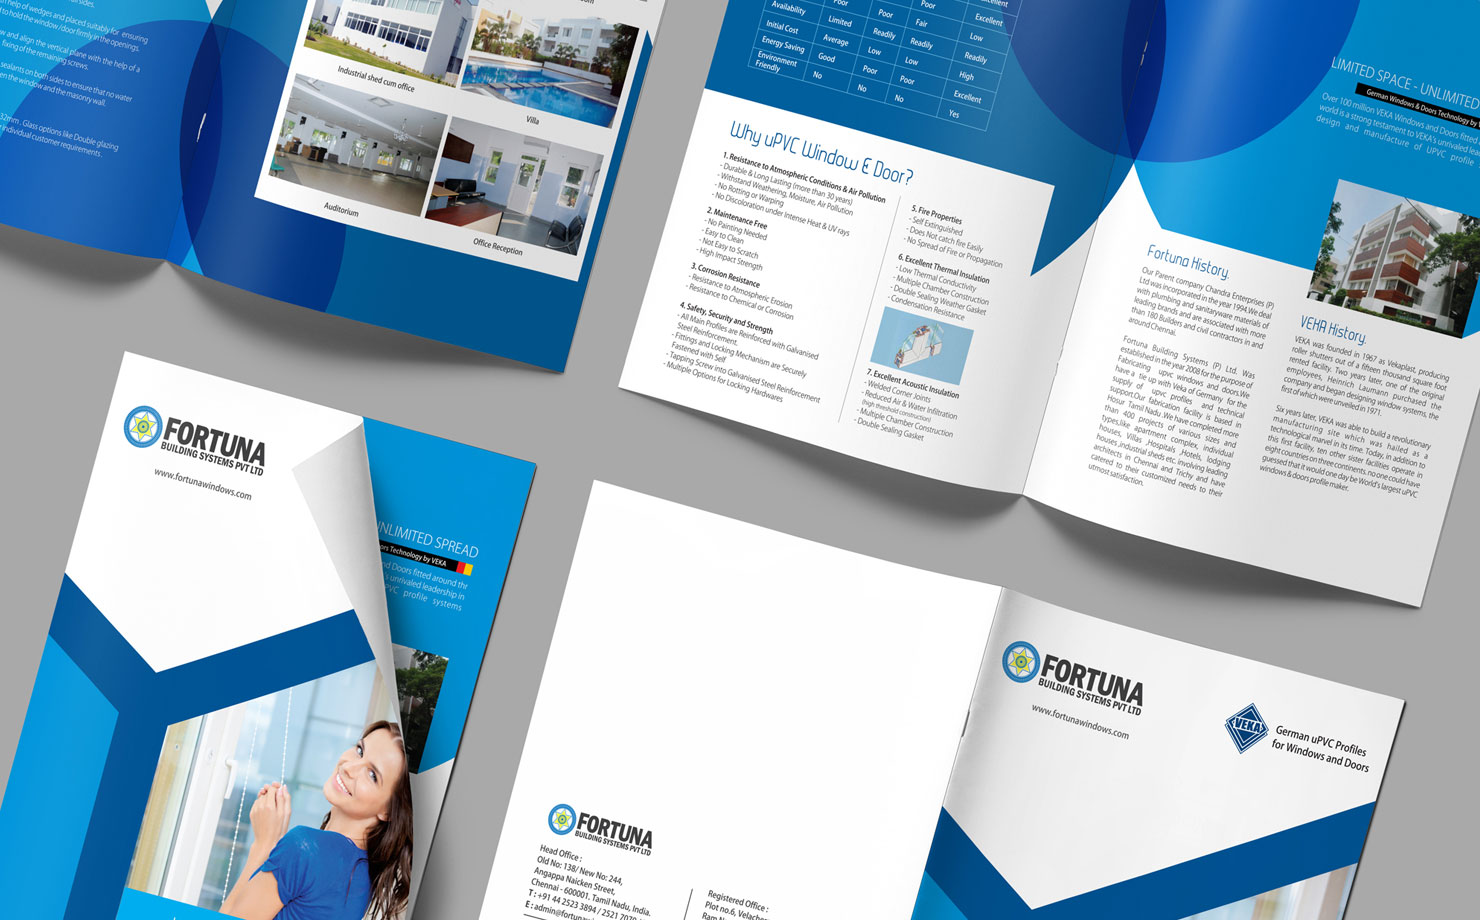 web-design-fortuna6